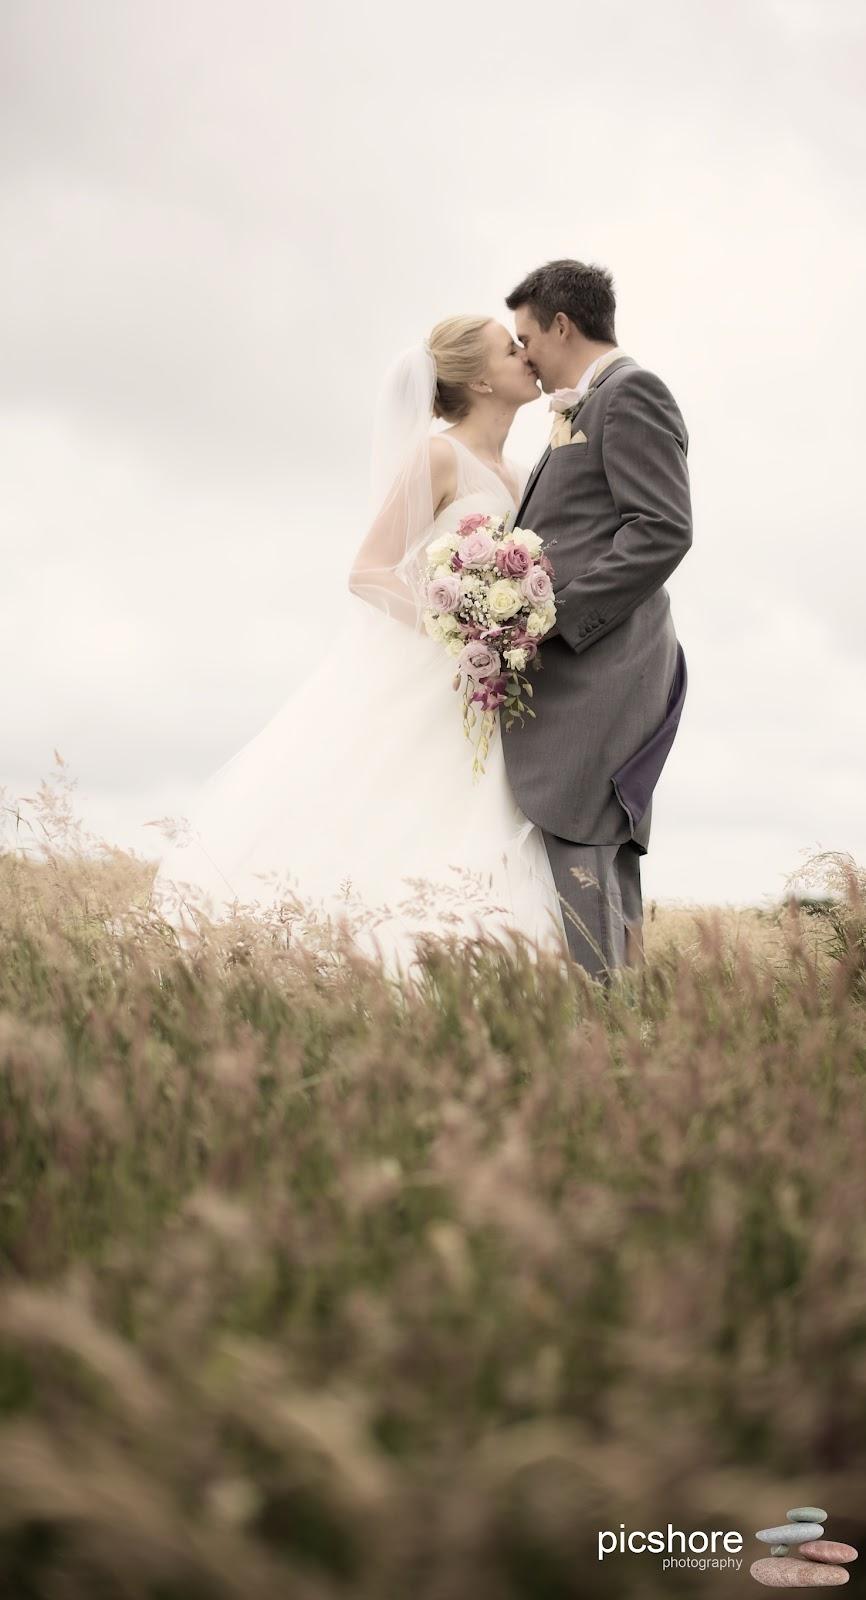 Picshore Photography Photos From The Wedding Of Lizzie Amp Matt At St Mellion International